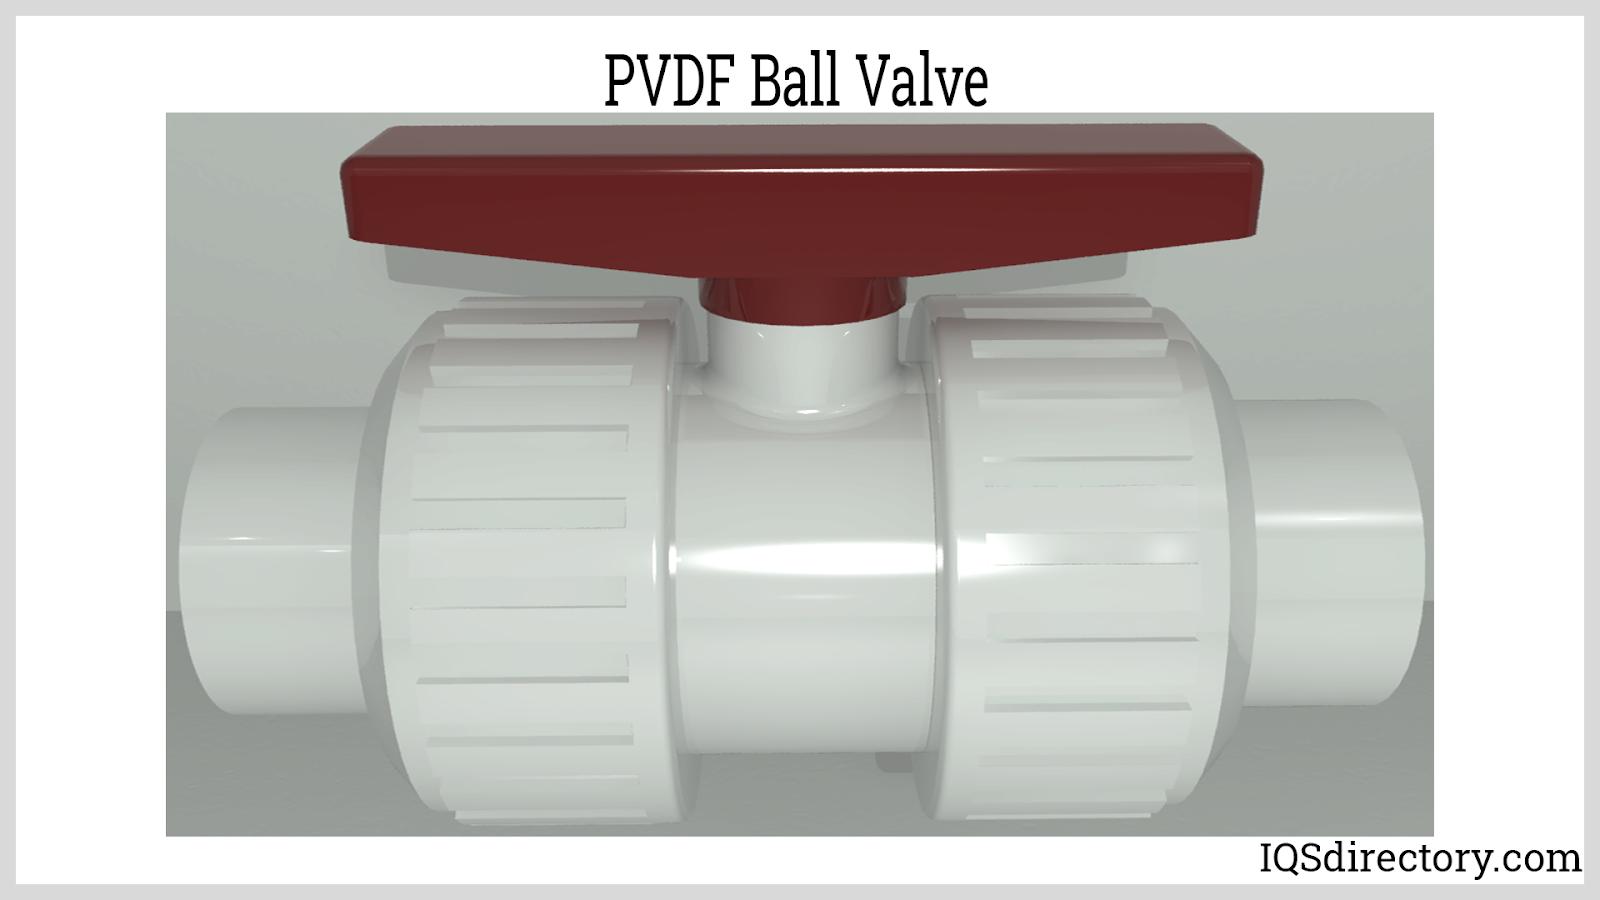 PVDF Ball Valve